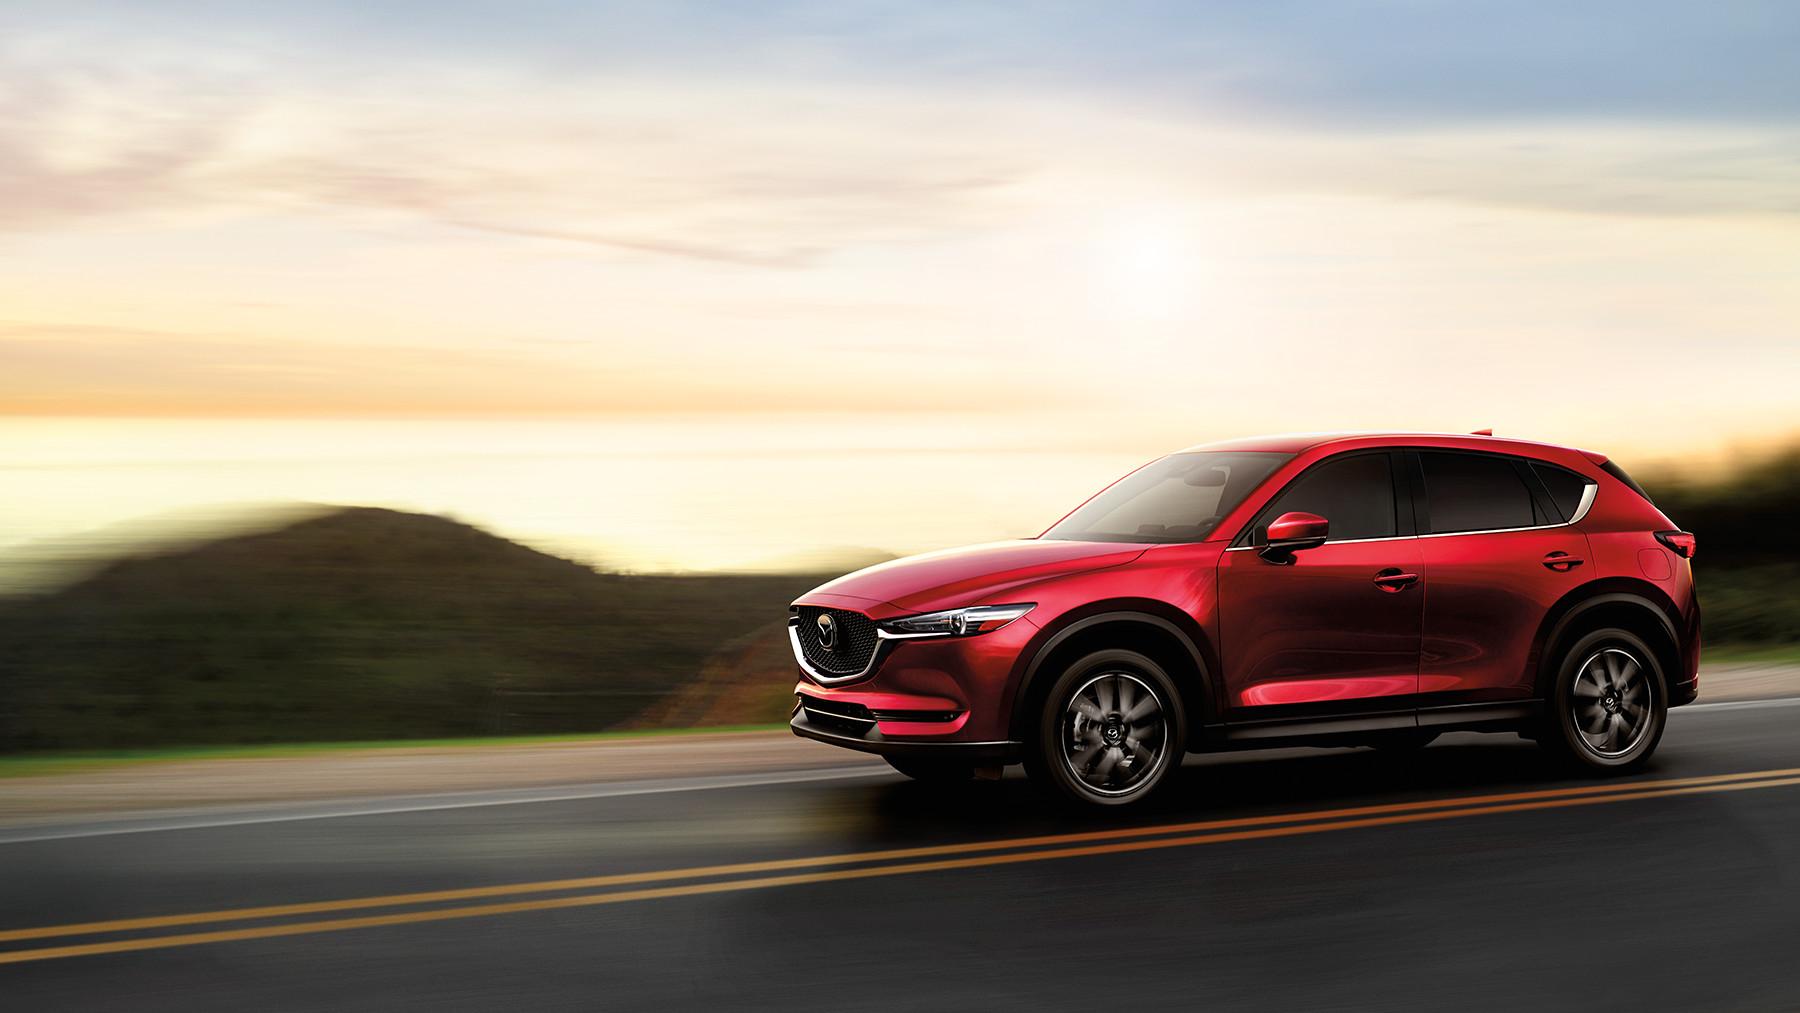 2017 Mazda CX-5 Leasing near Augusta, GA